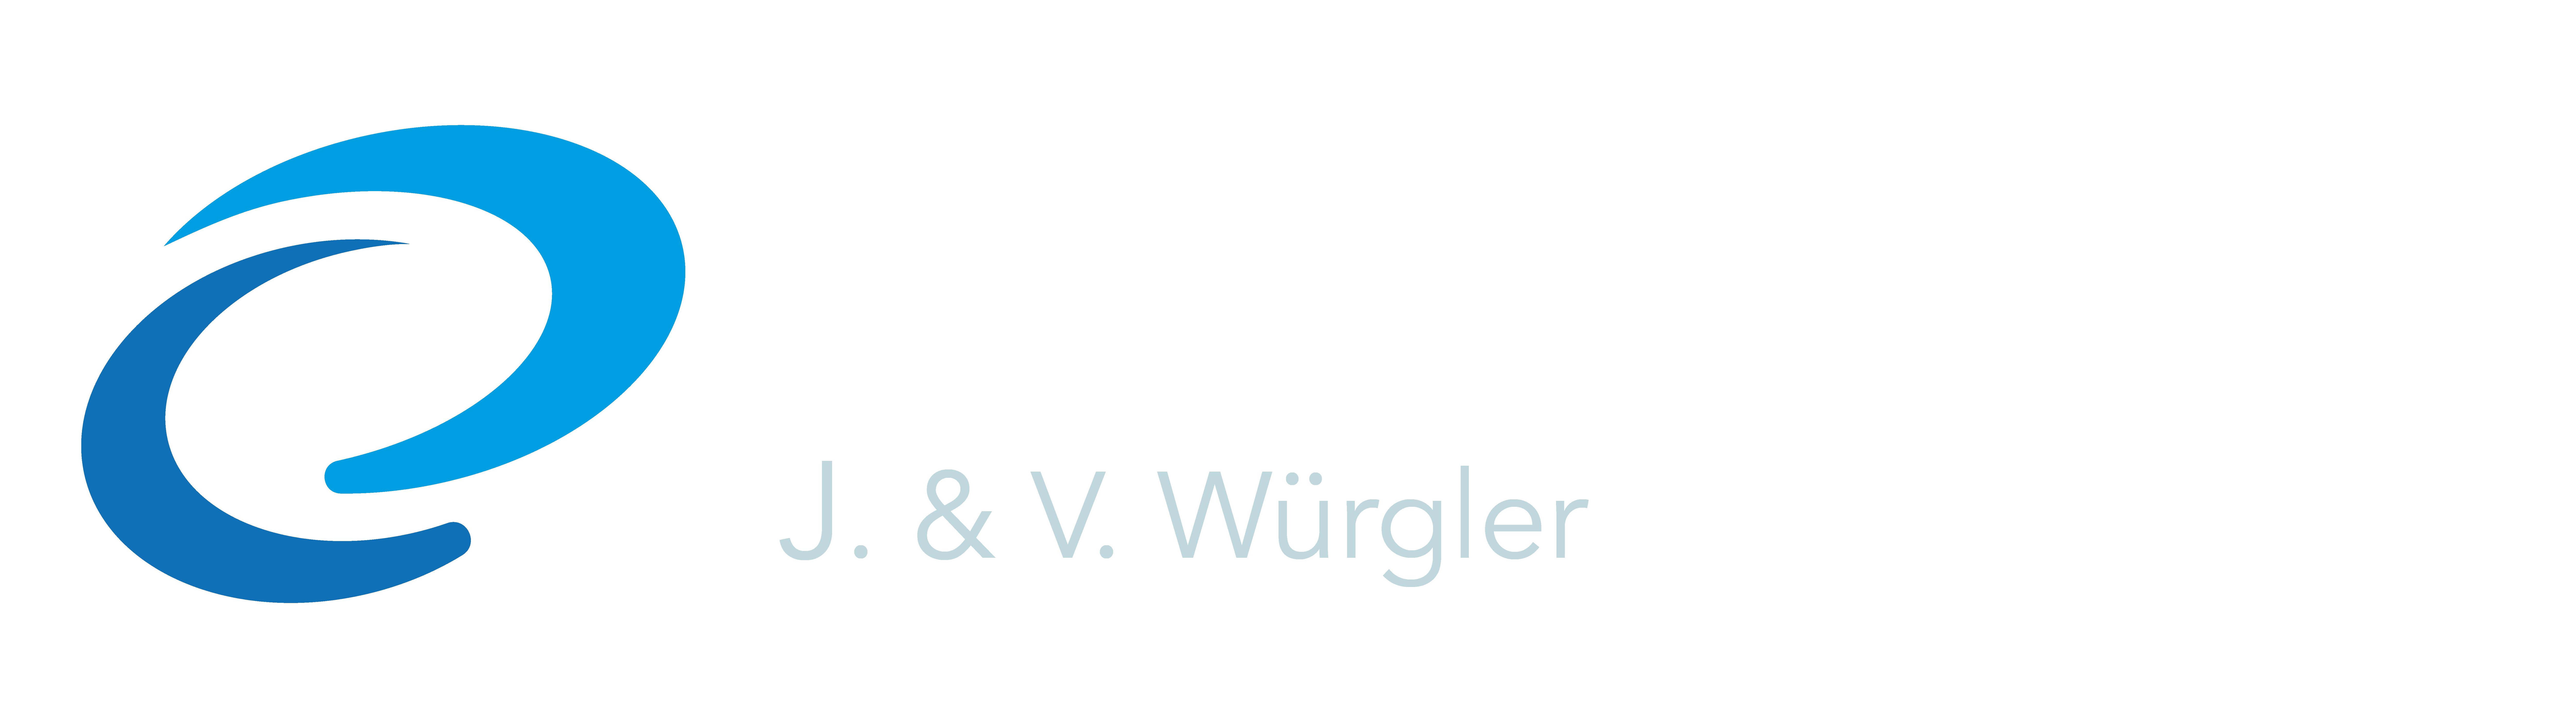 Human Design System CH